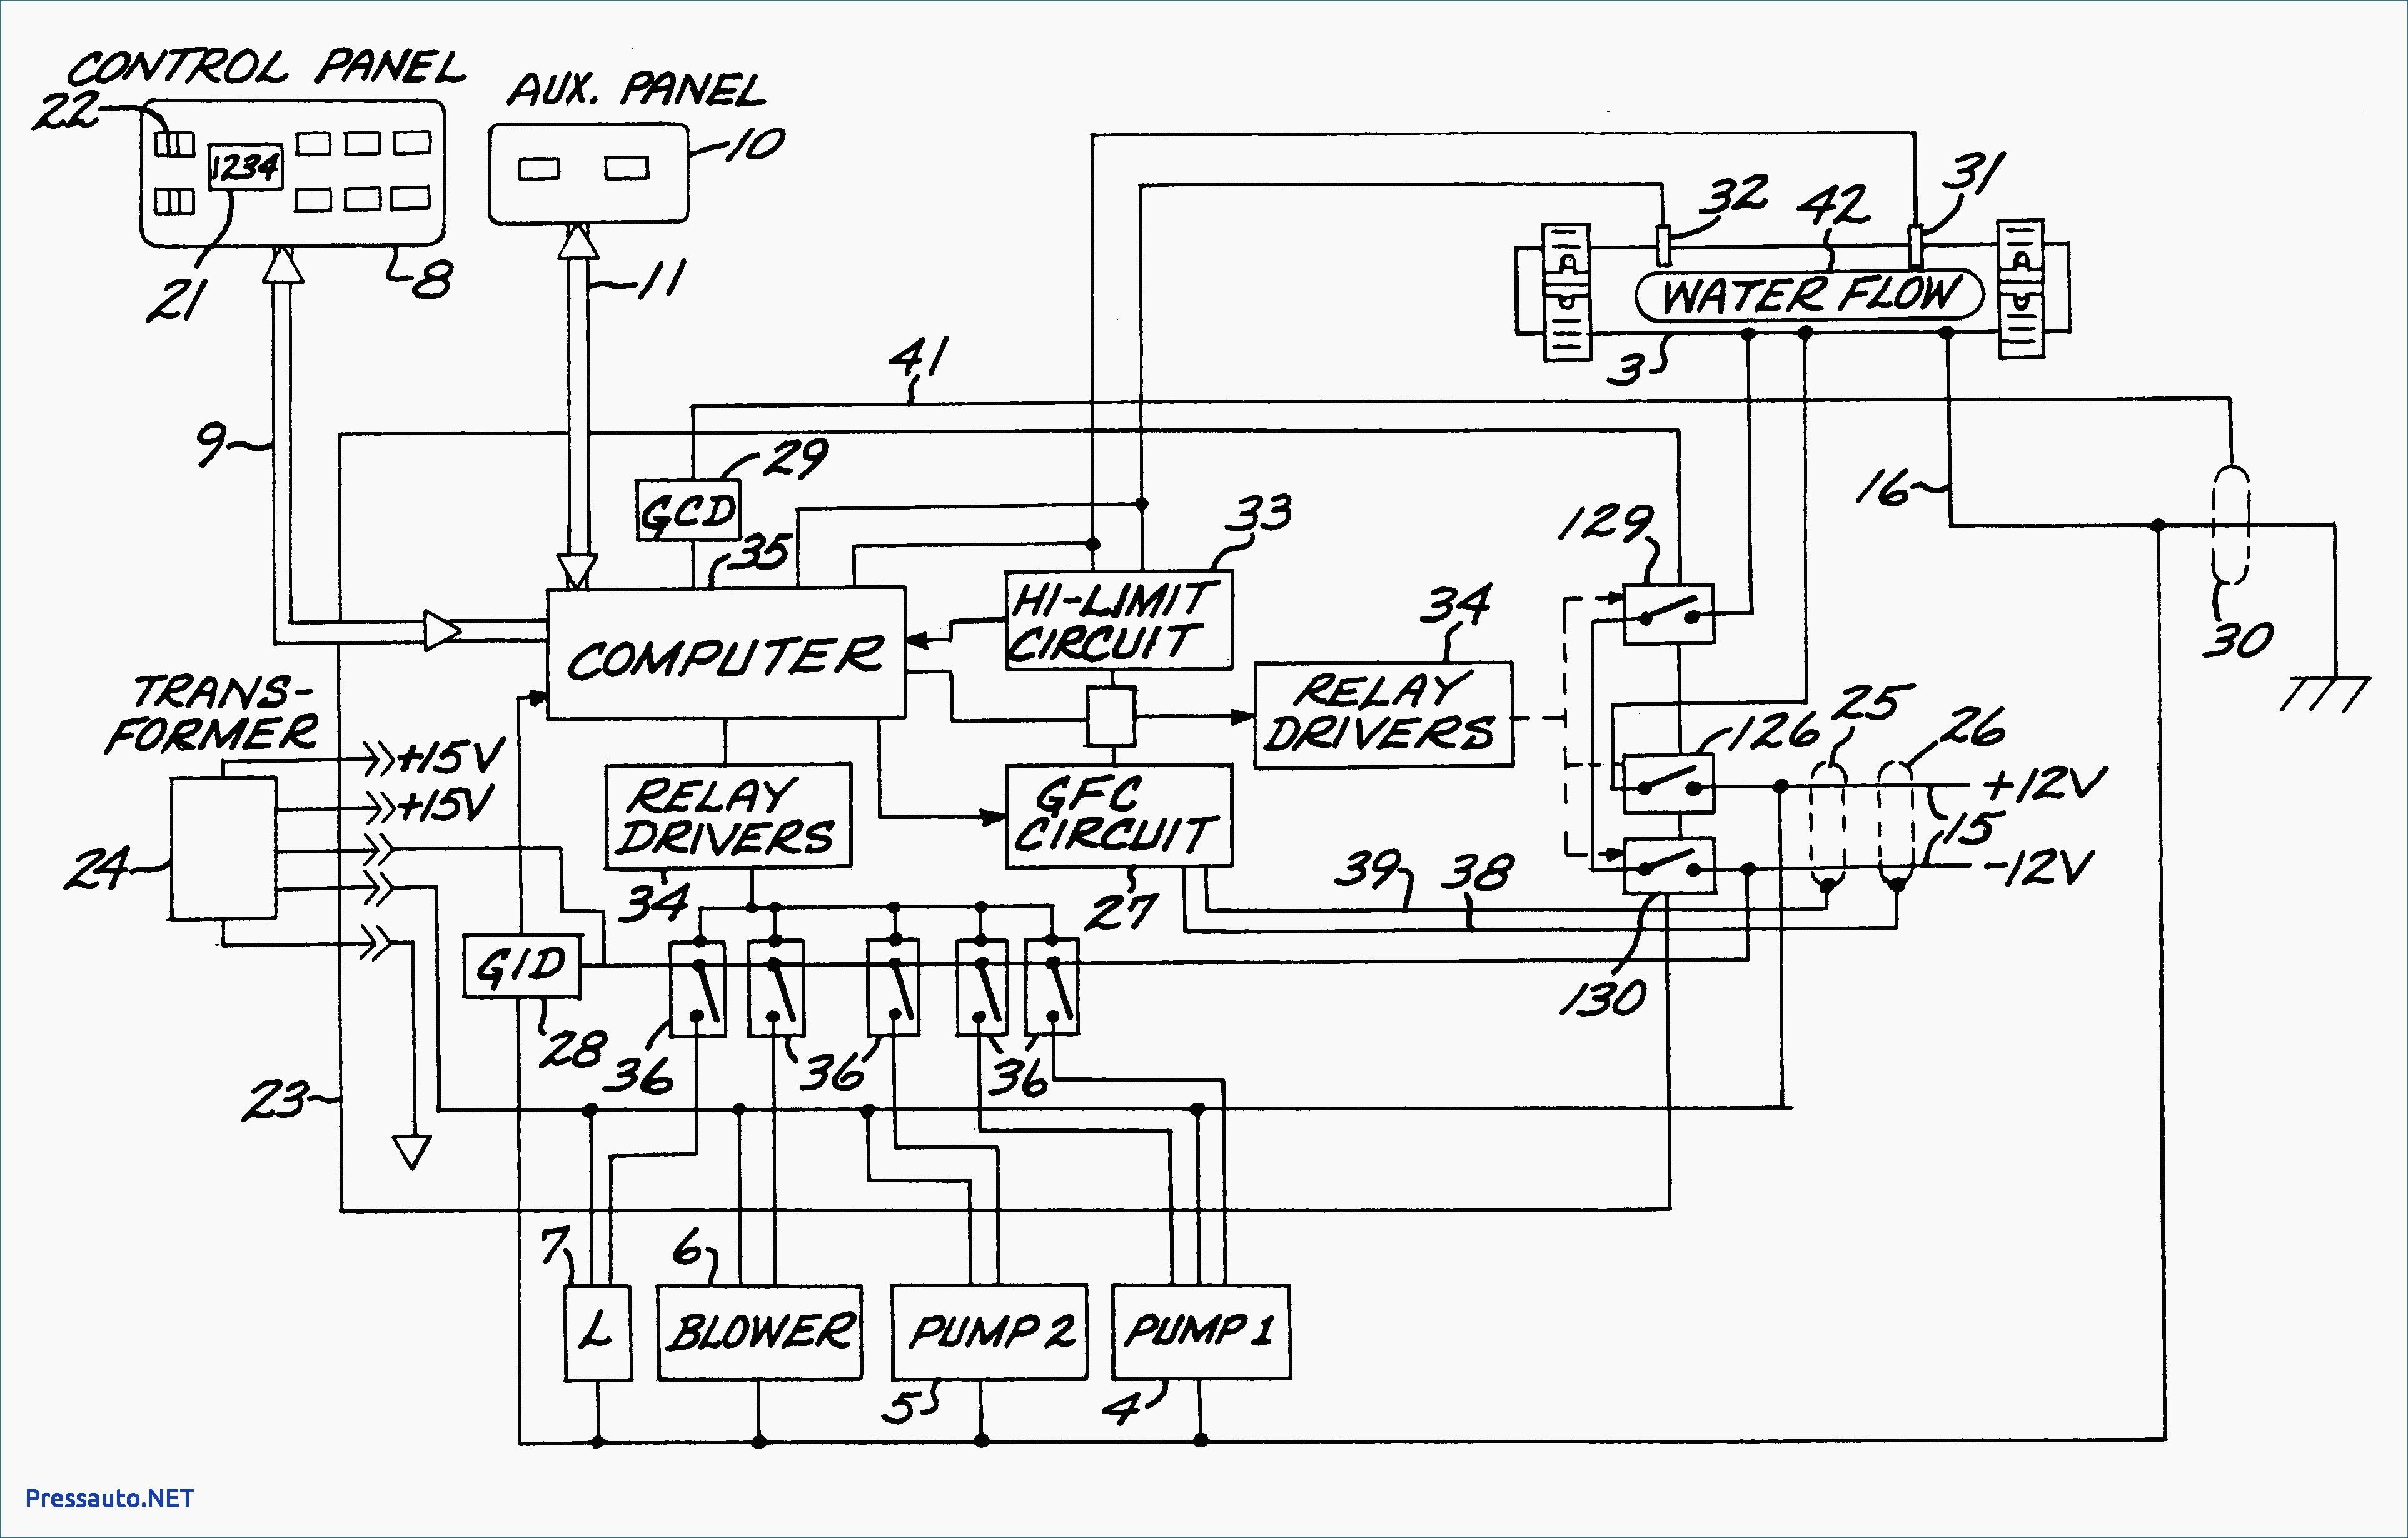 Catalina Spa Wiring Diagram Diagrams Schematics Best Gfci